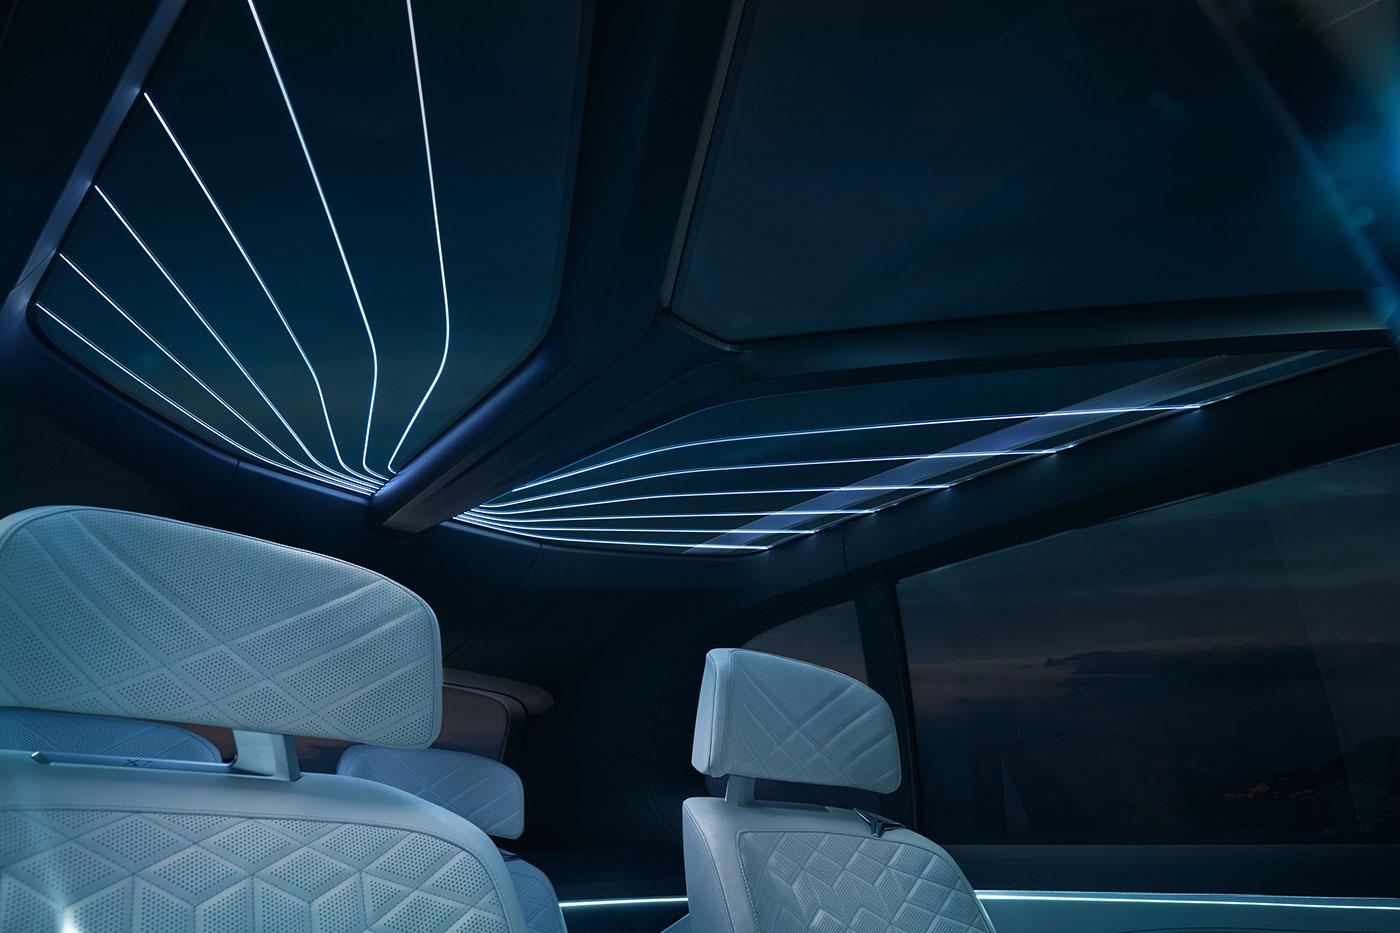 BMW Concept X7 iPerformance on